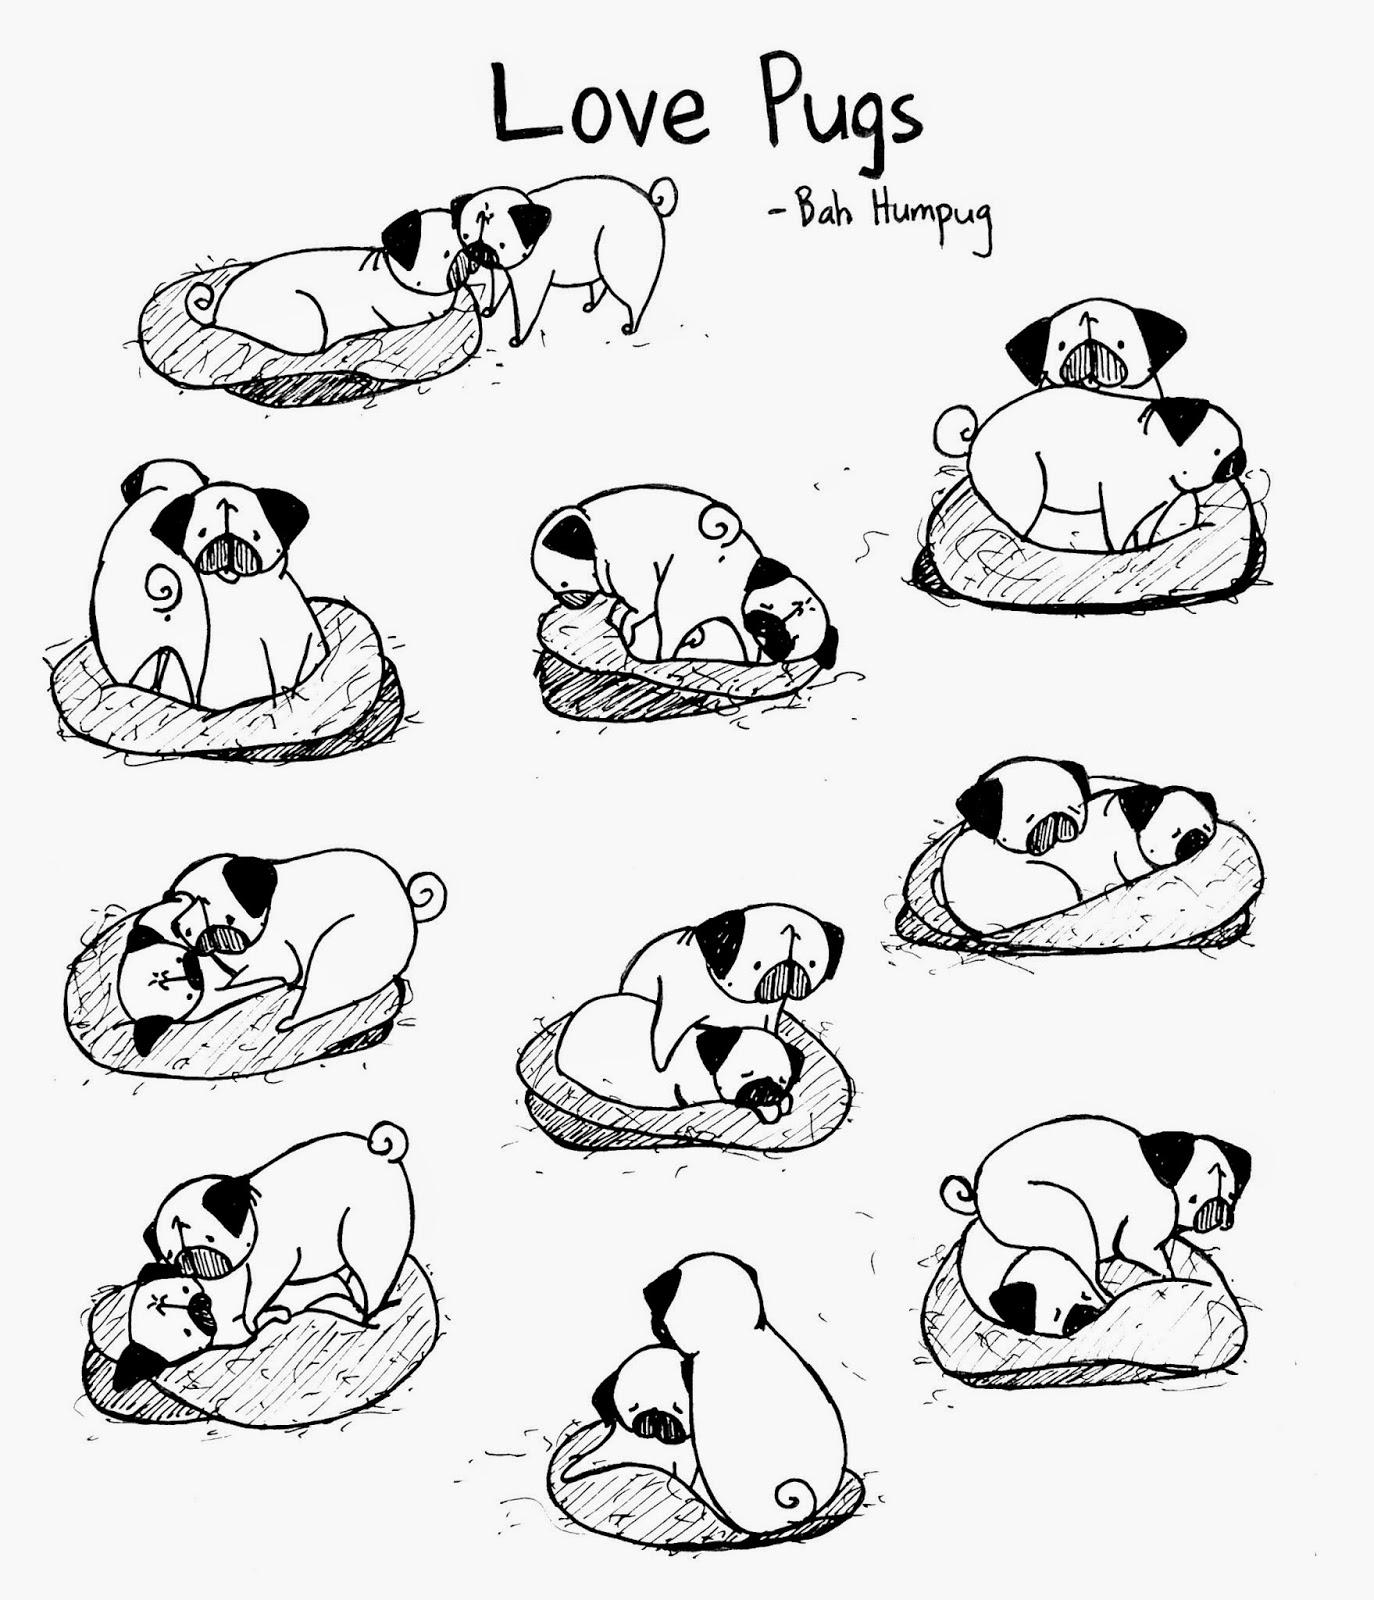 Drawn pug poo Was Humpug: and that would